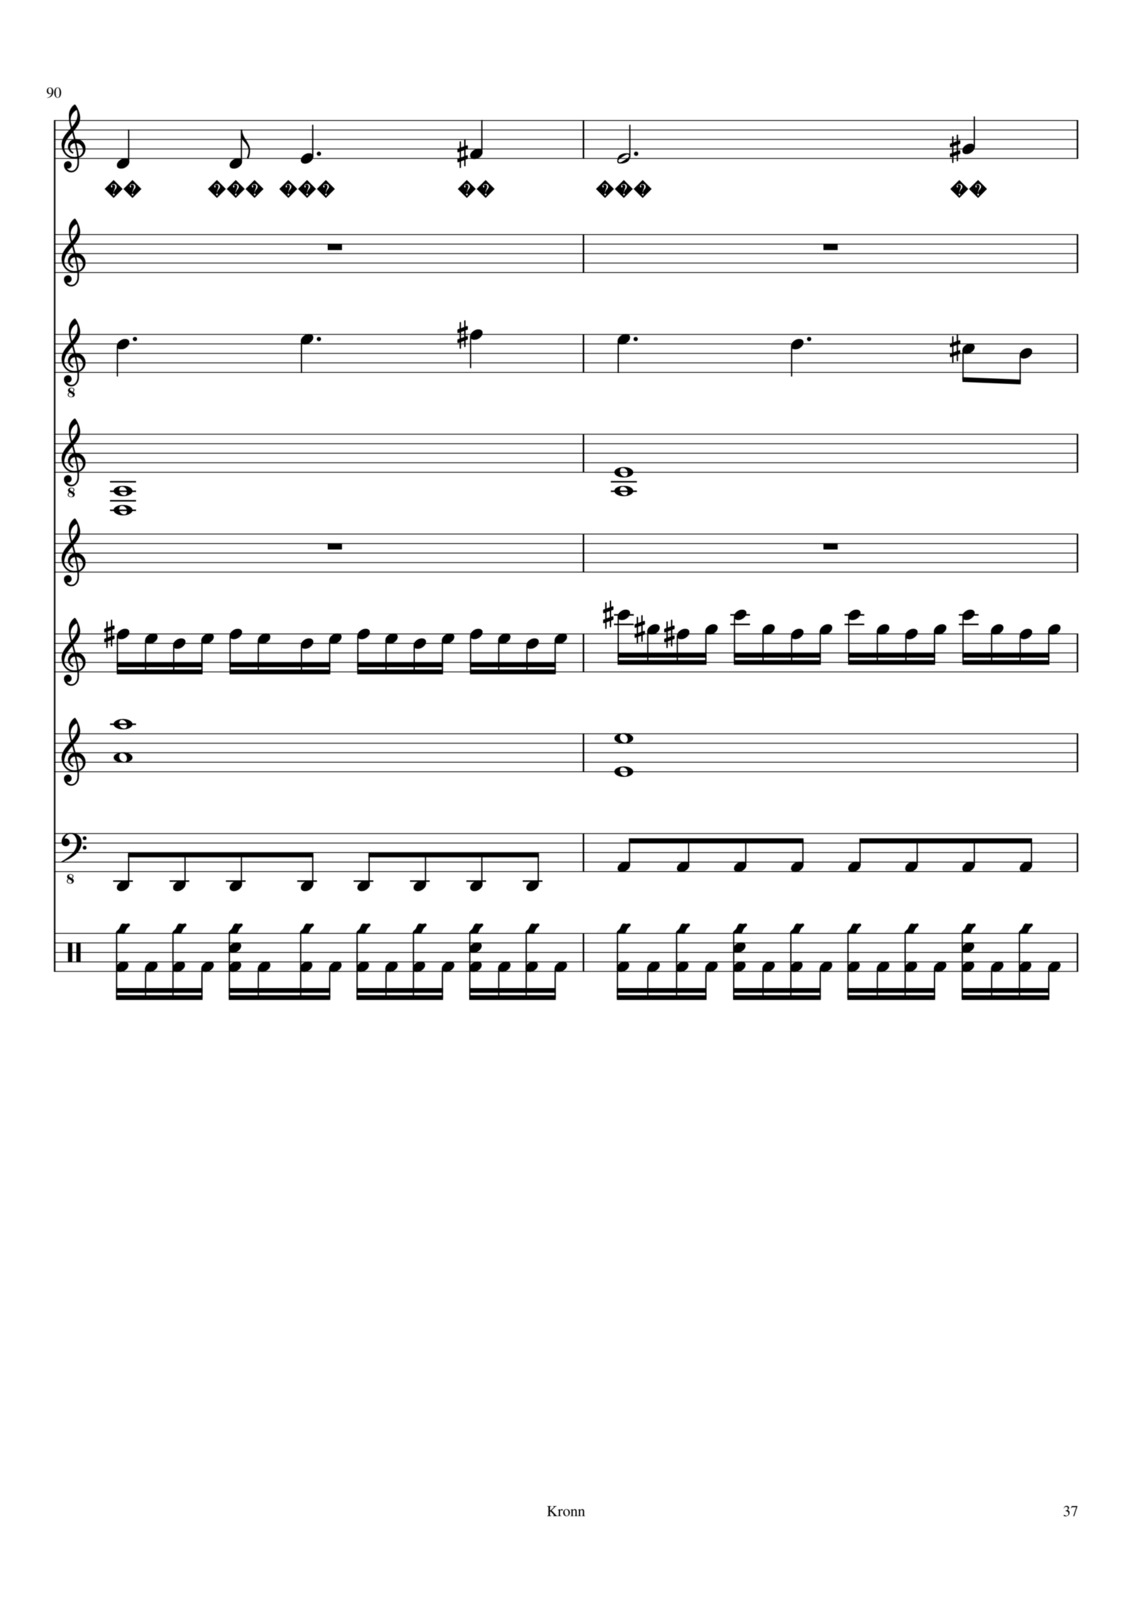 Ispoved Pervogo Boga slide, Image 37